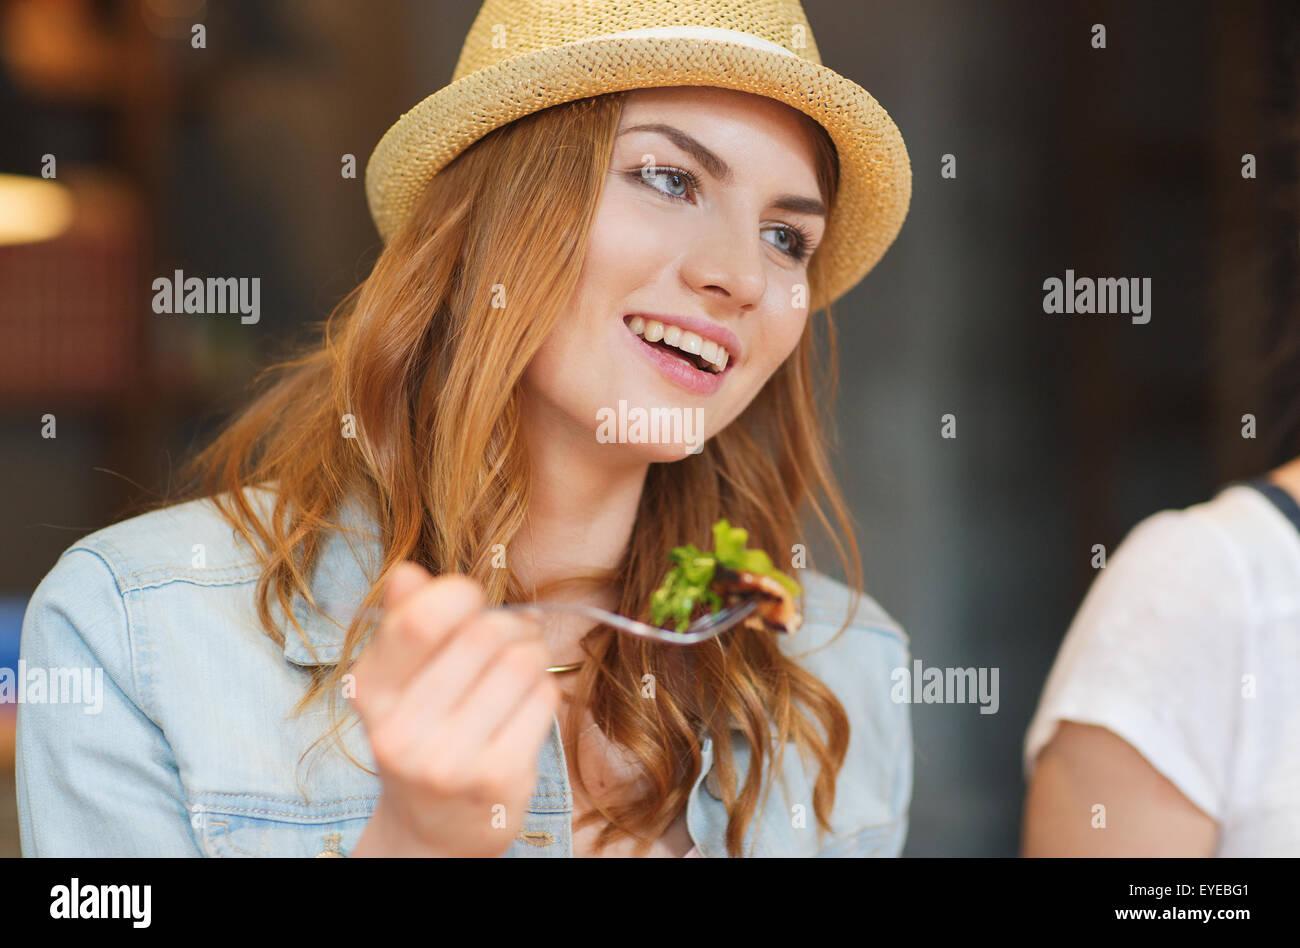 glückliche junge Frau essen Salat an Bar oder Kneipe Stockbild